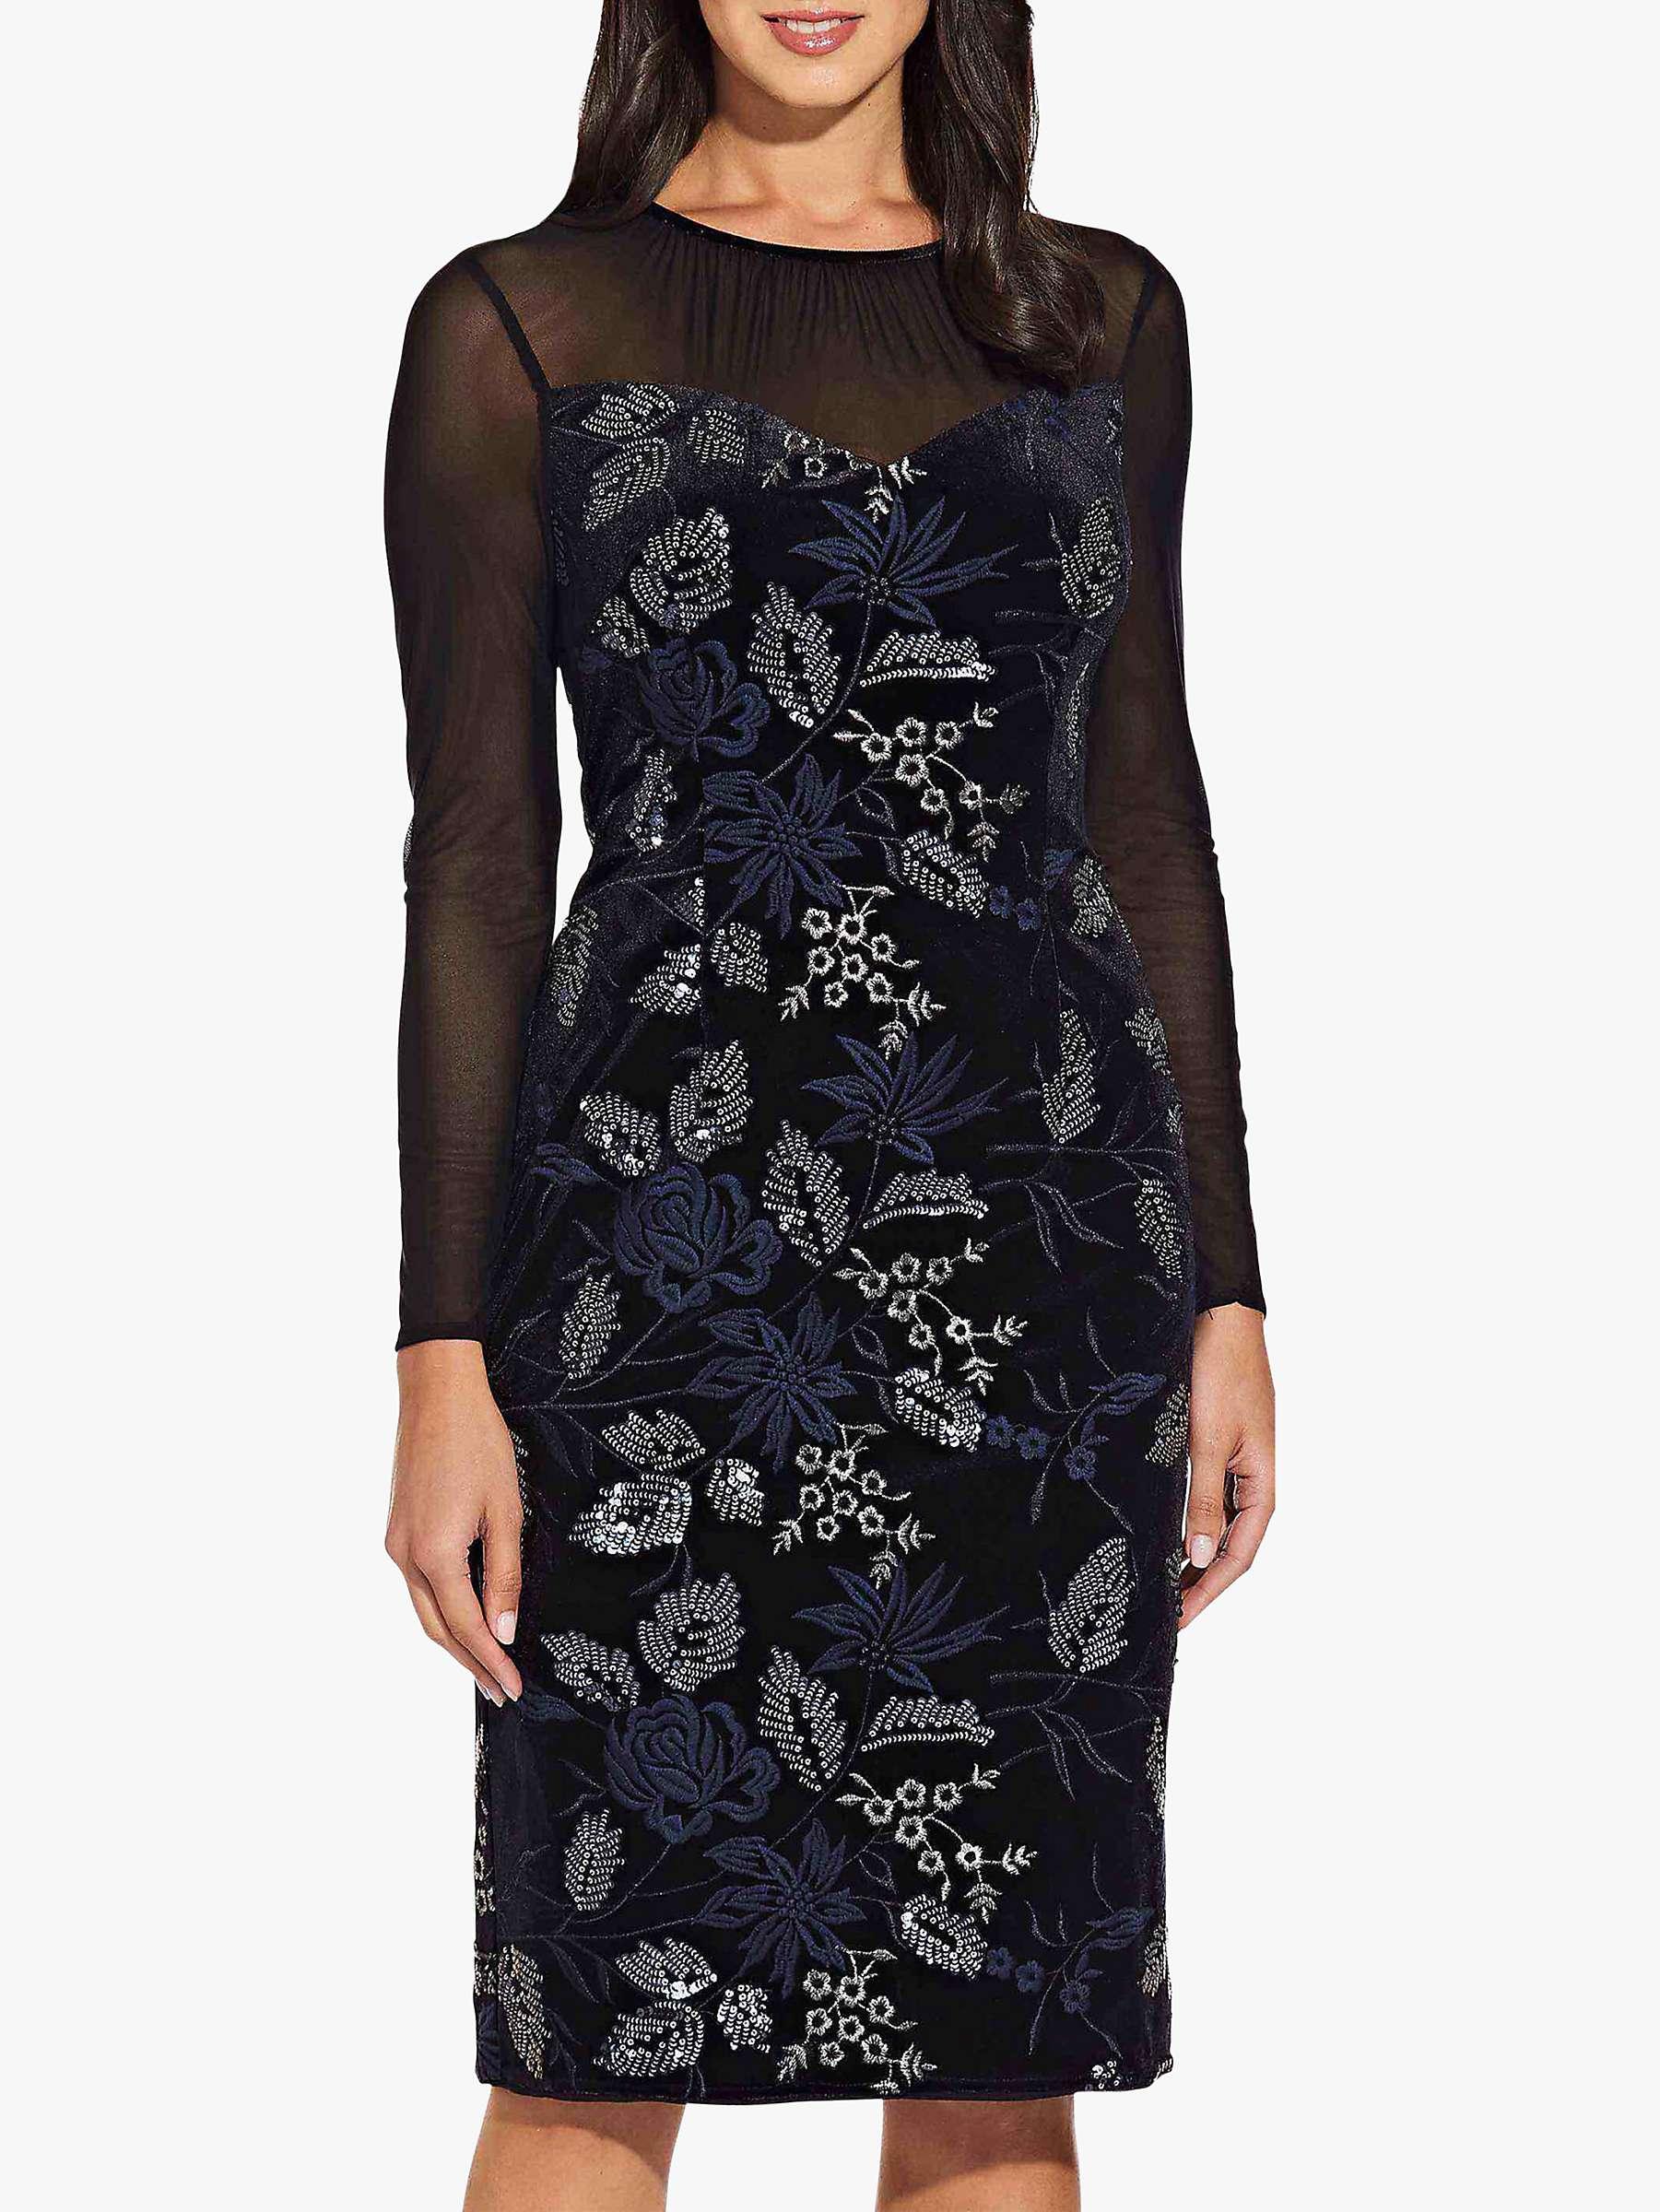 Adrianna Papell Natalia Floral Lace Dress Blacknavy